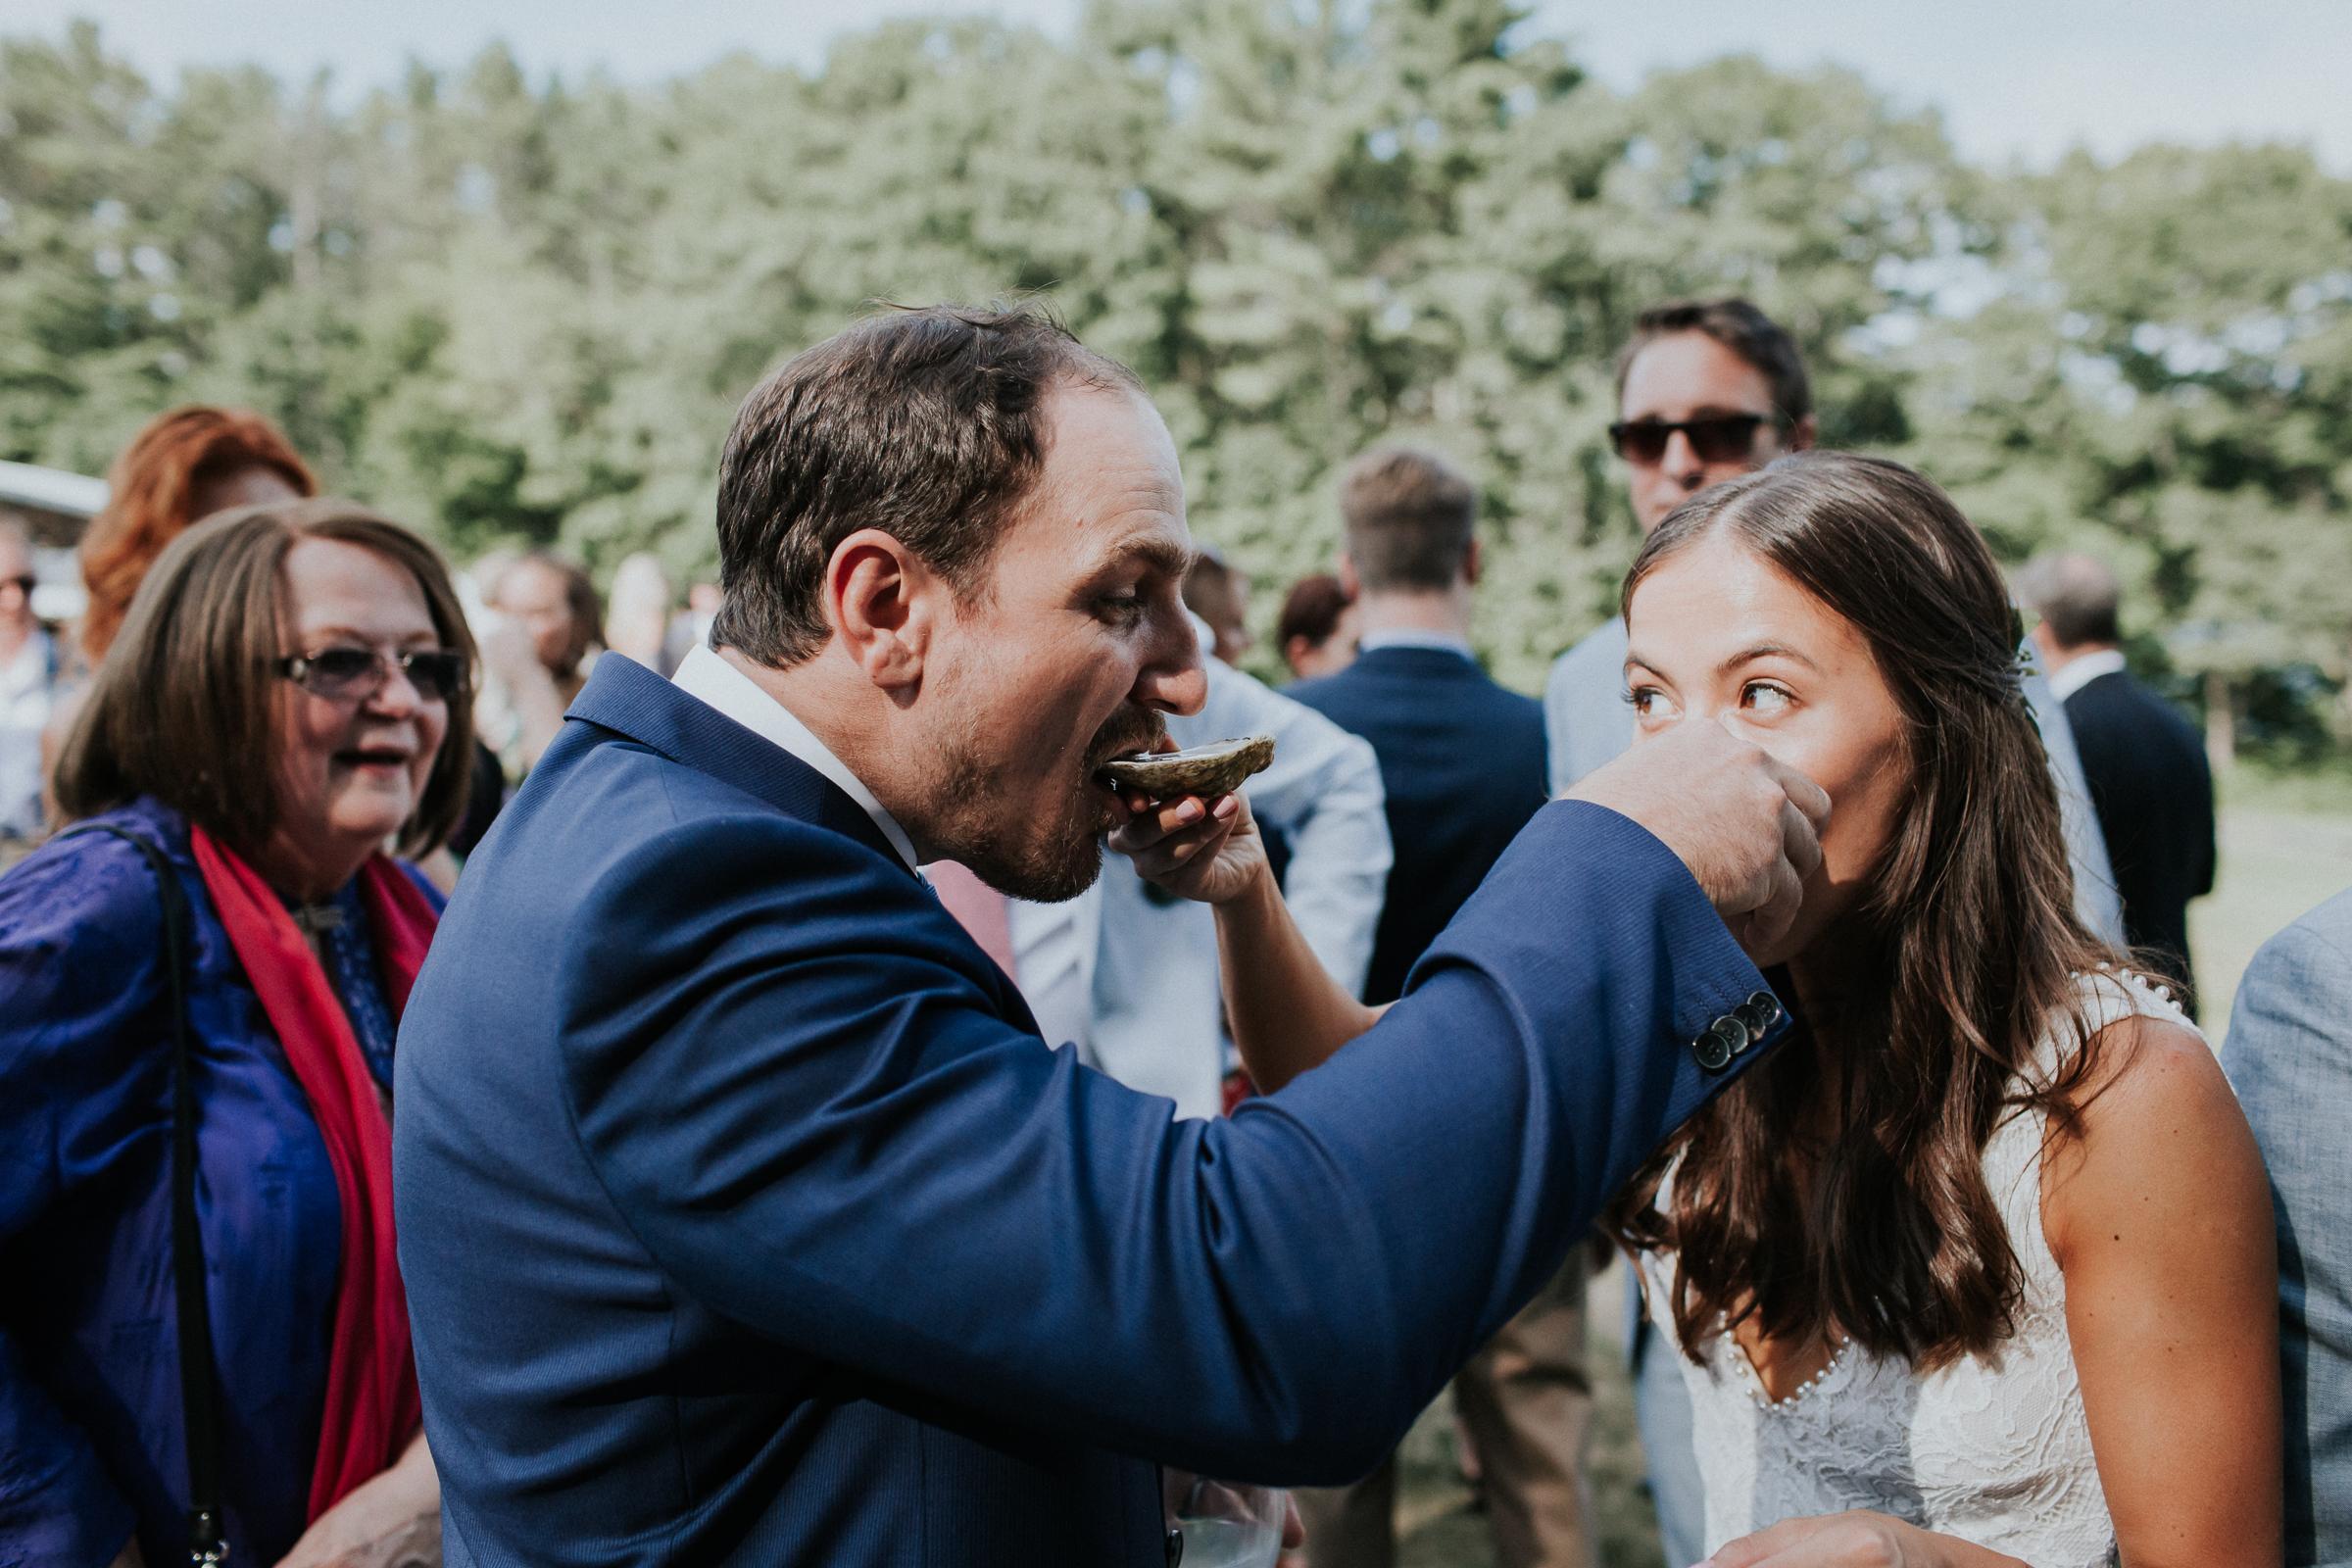 Marianmade-Farm-Wiscasset-Maine-Fine-Art-Documentary-Wedding-Photographer-Elvira-Kalviste-Photography-102.jpg